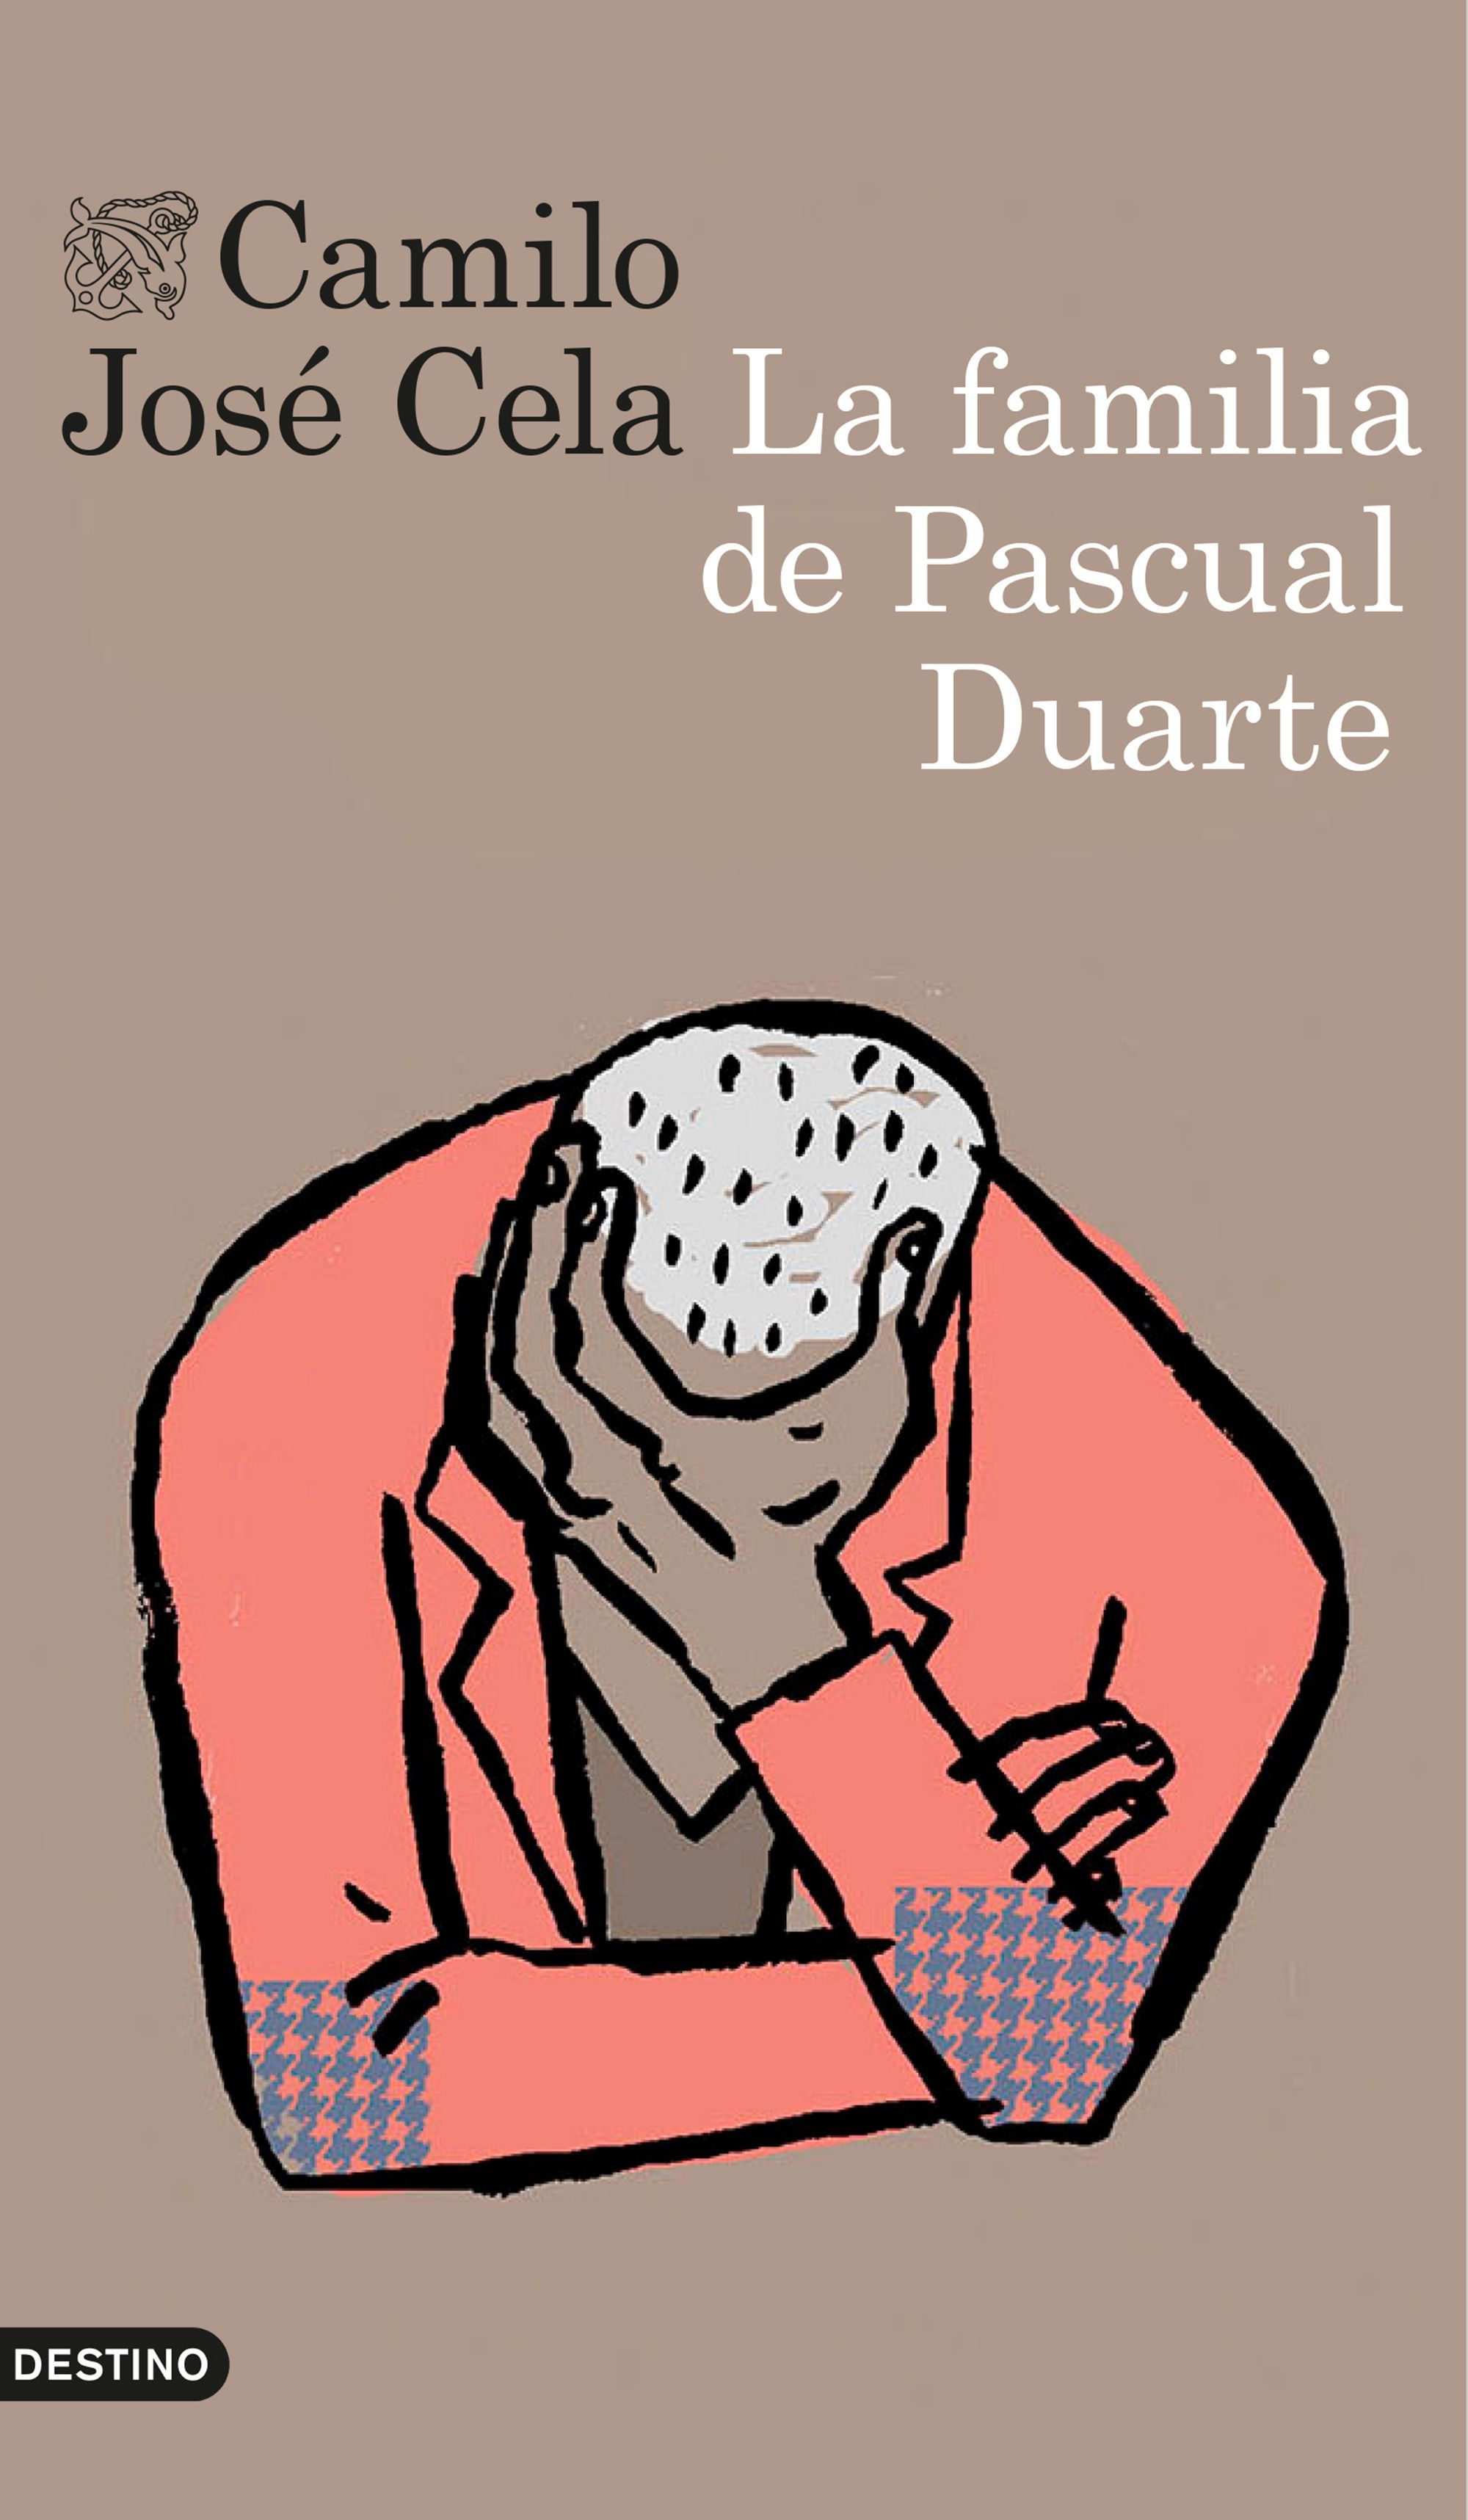 Portada La Familia De Pascual Duarte Camilo Jose Cela 201510231045 Jpg 2000 3433 Fiction Books Ebooks Ebooks Library